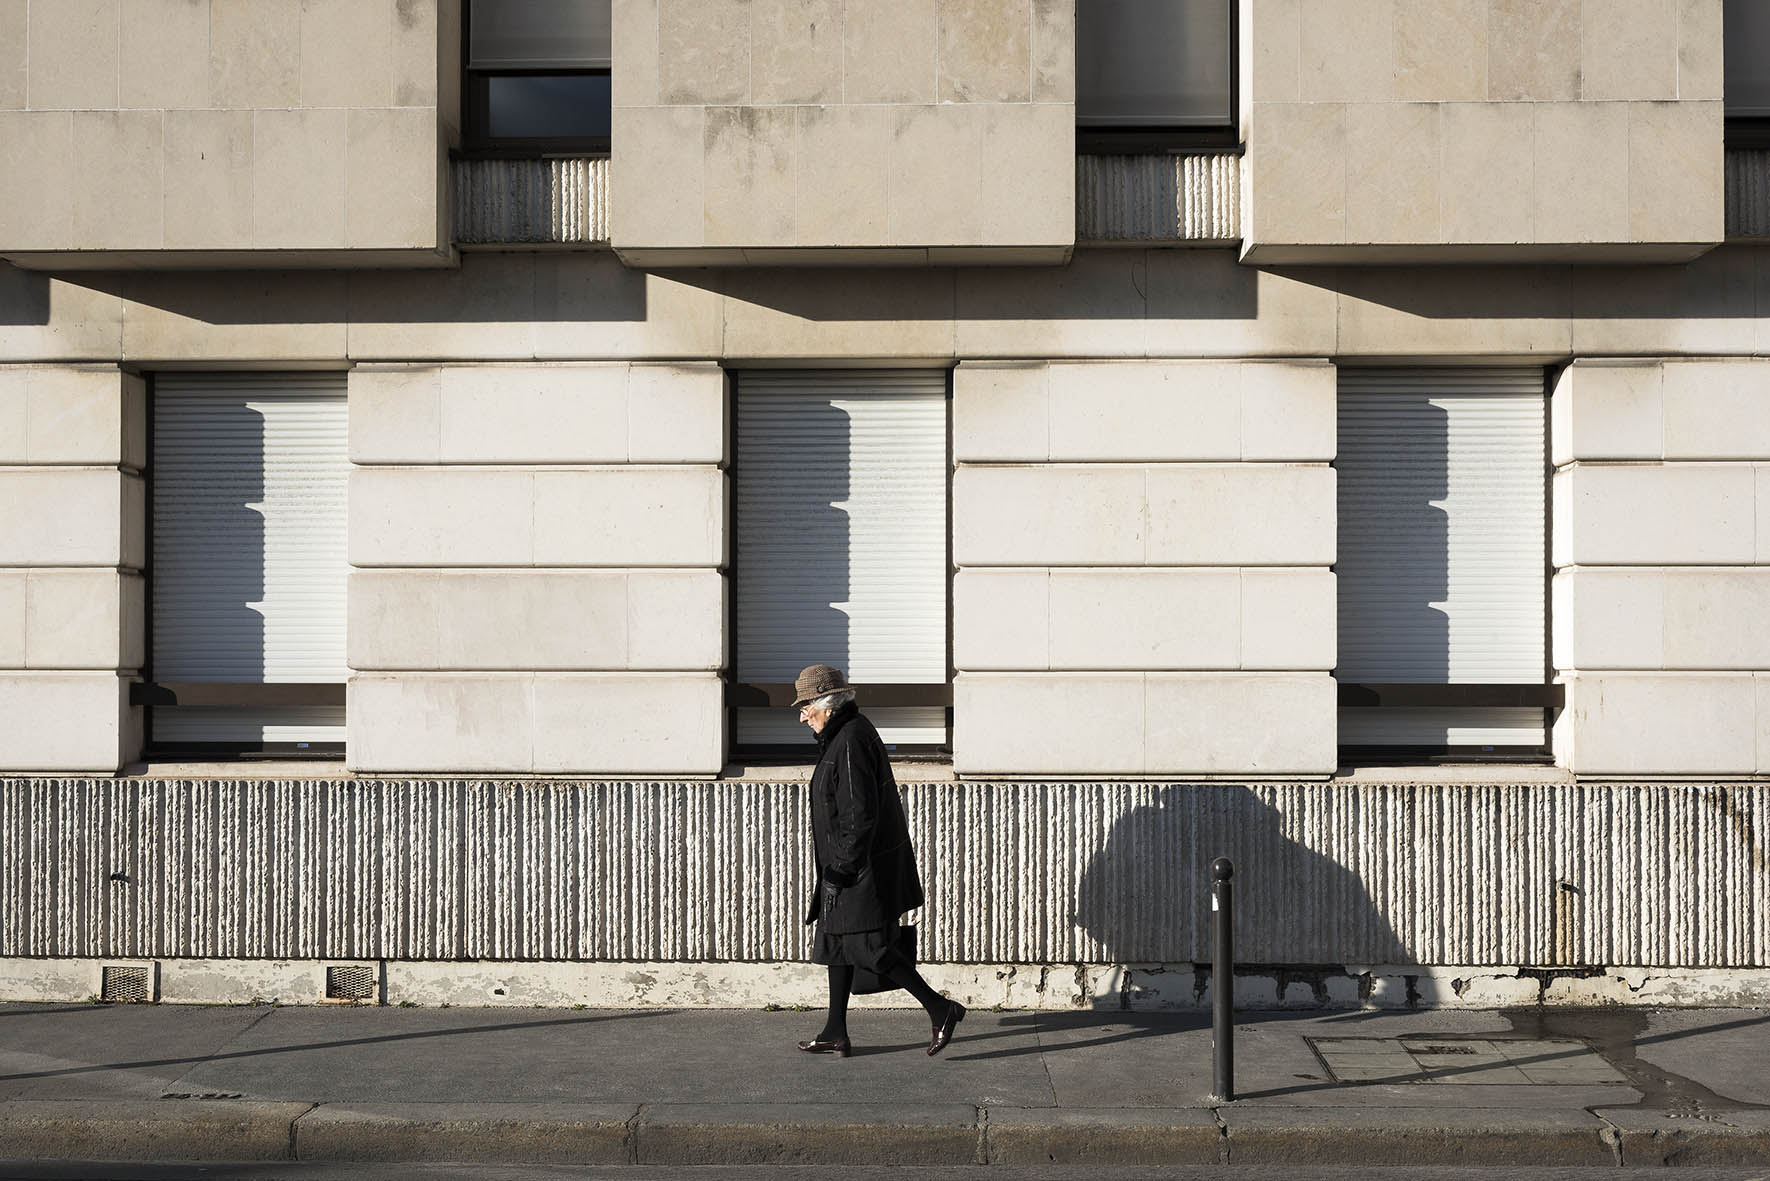 09.03.16 28-30 rue de Babylone , 2016, archival photographic print, 23 x 18 cm